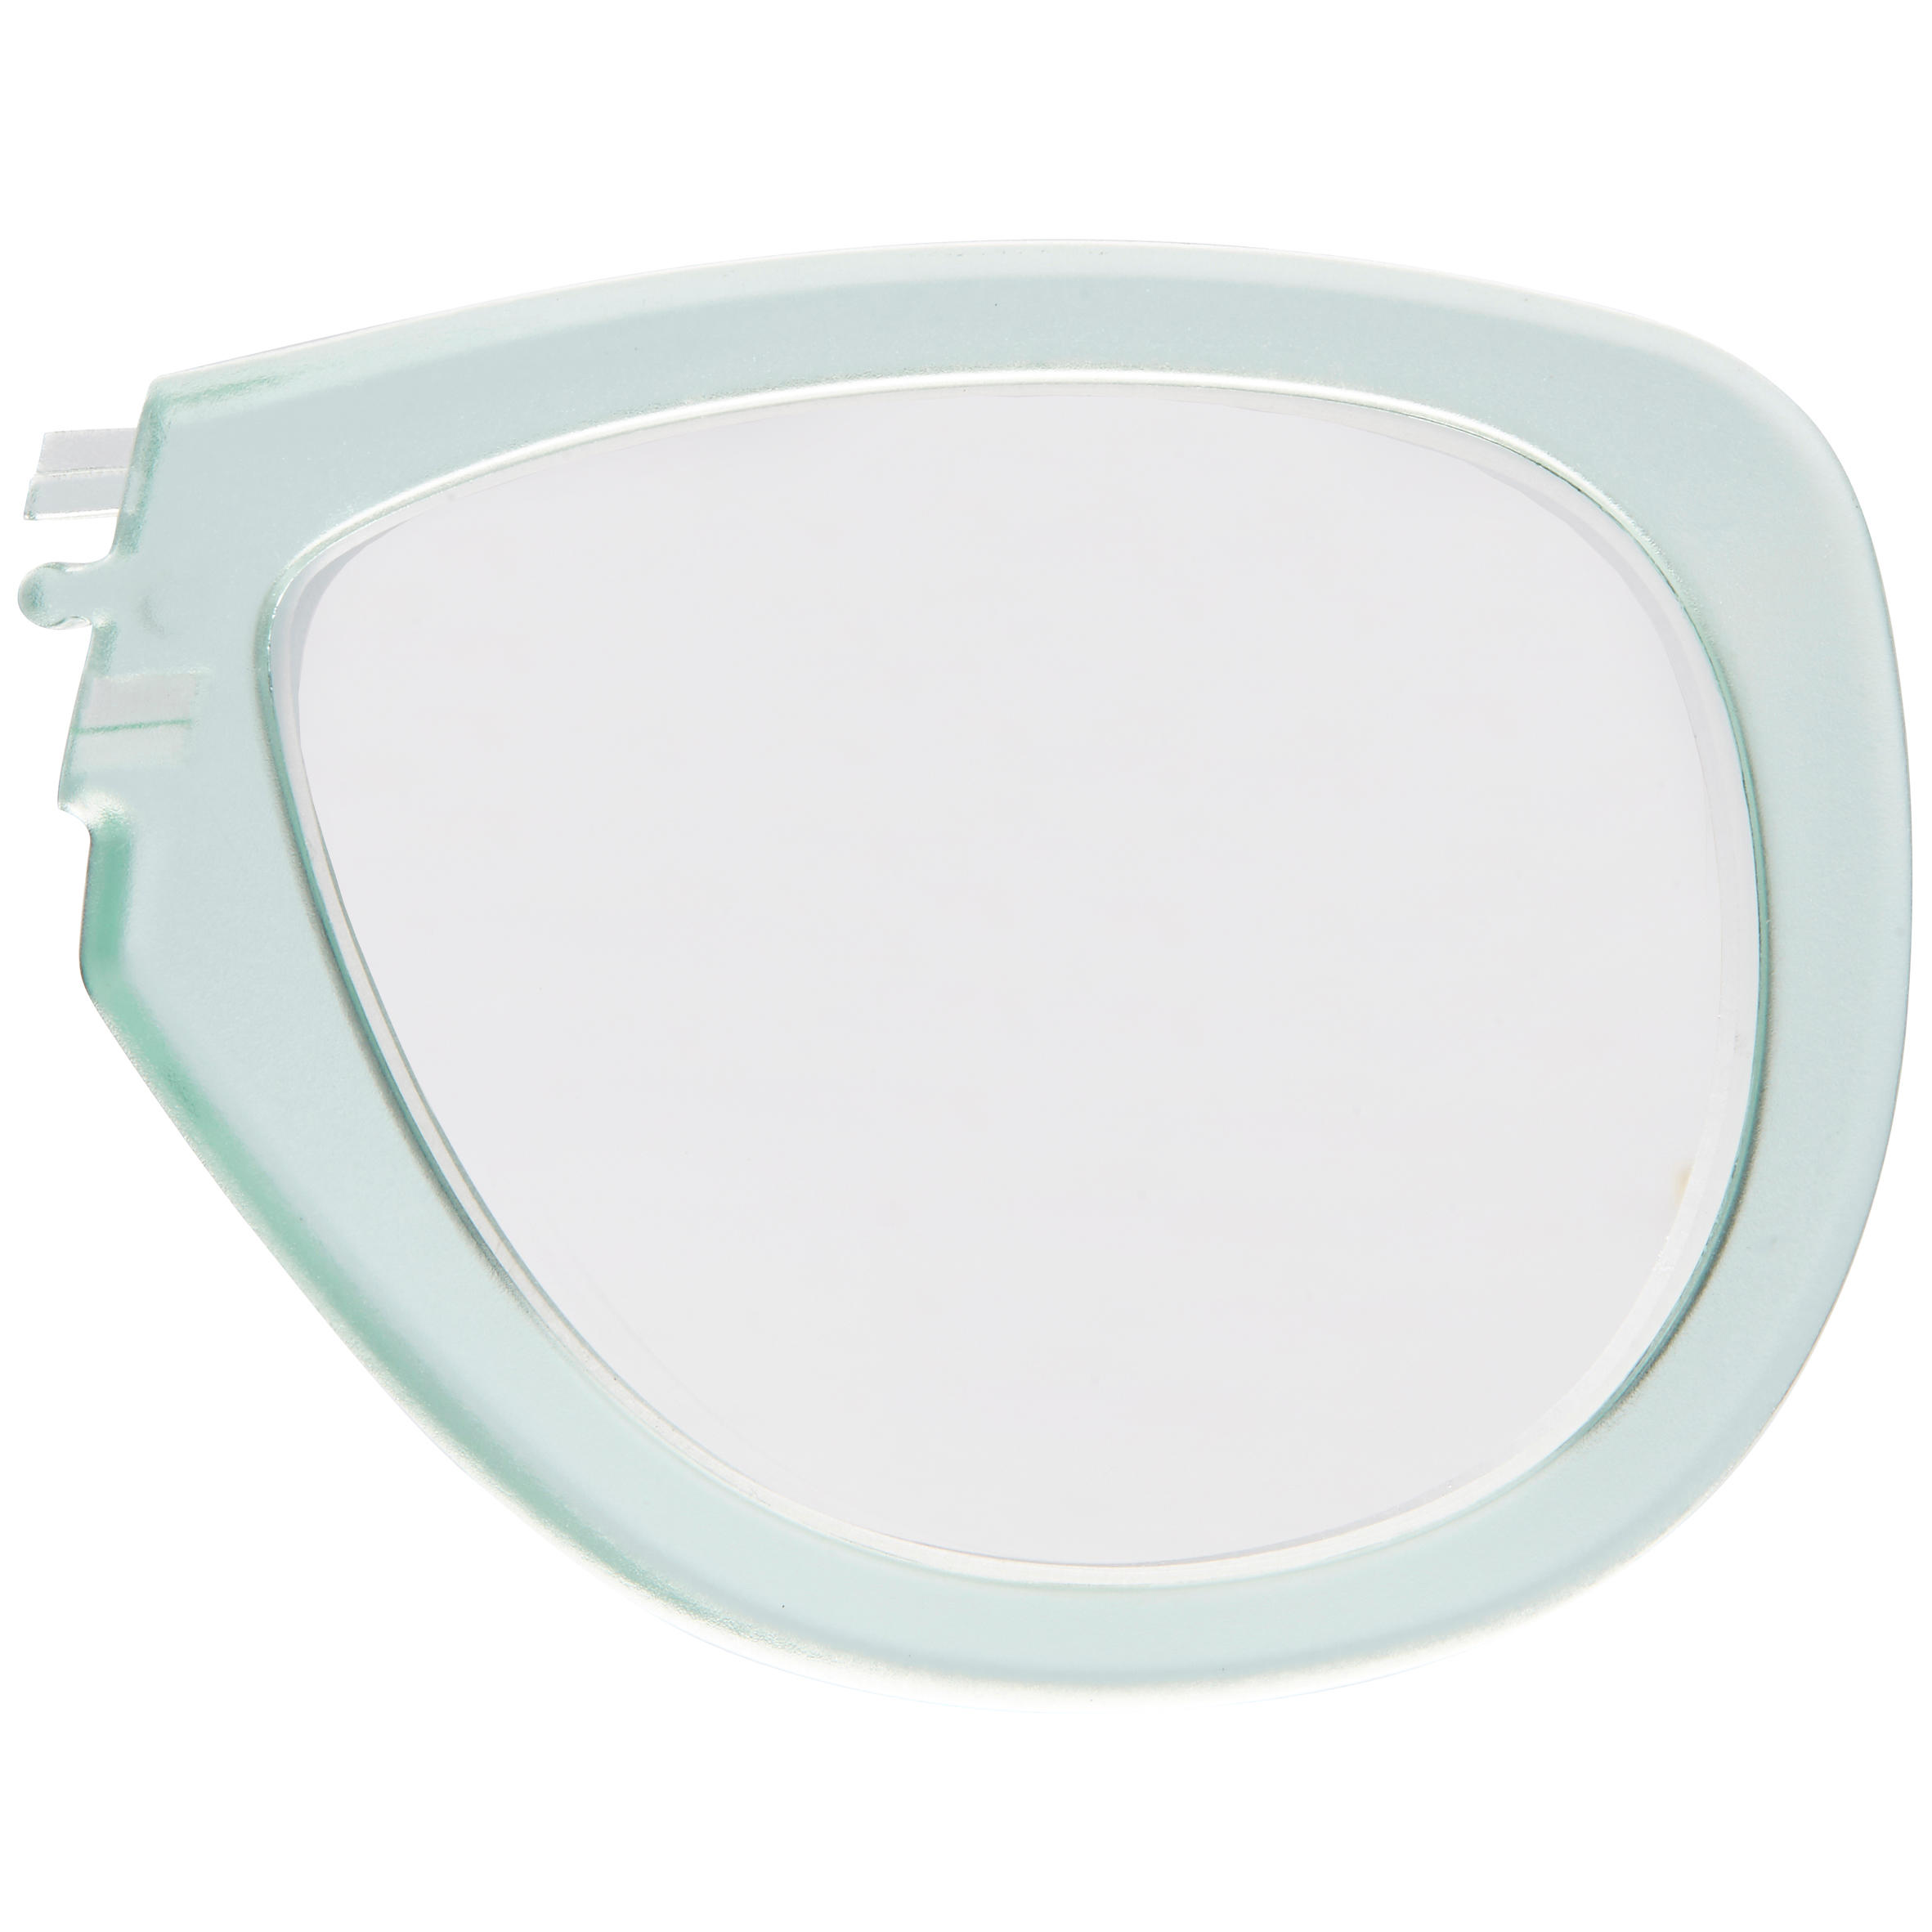 Lf corrective lens...